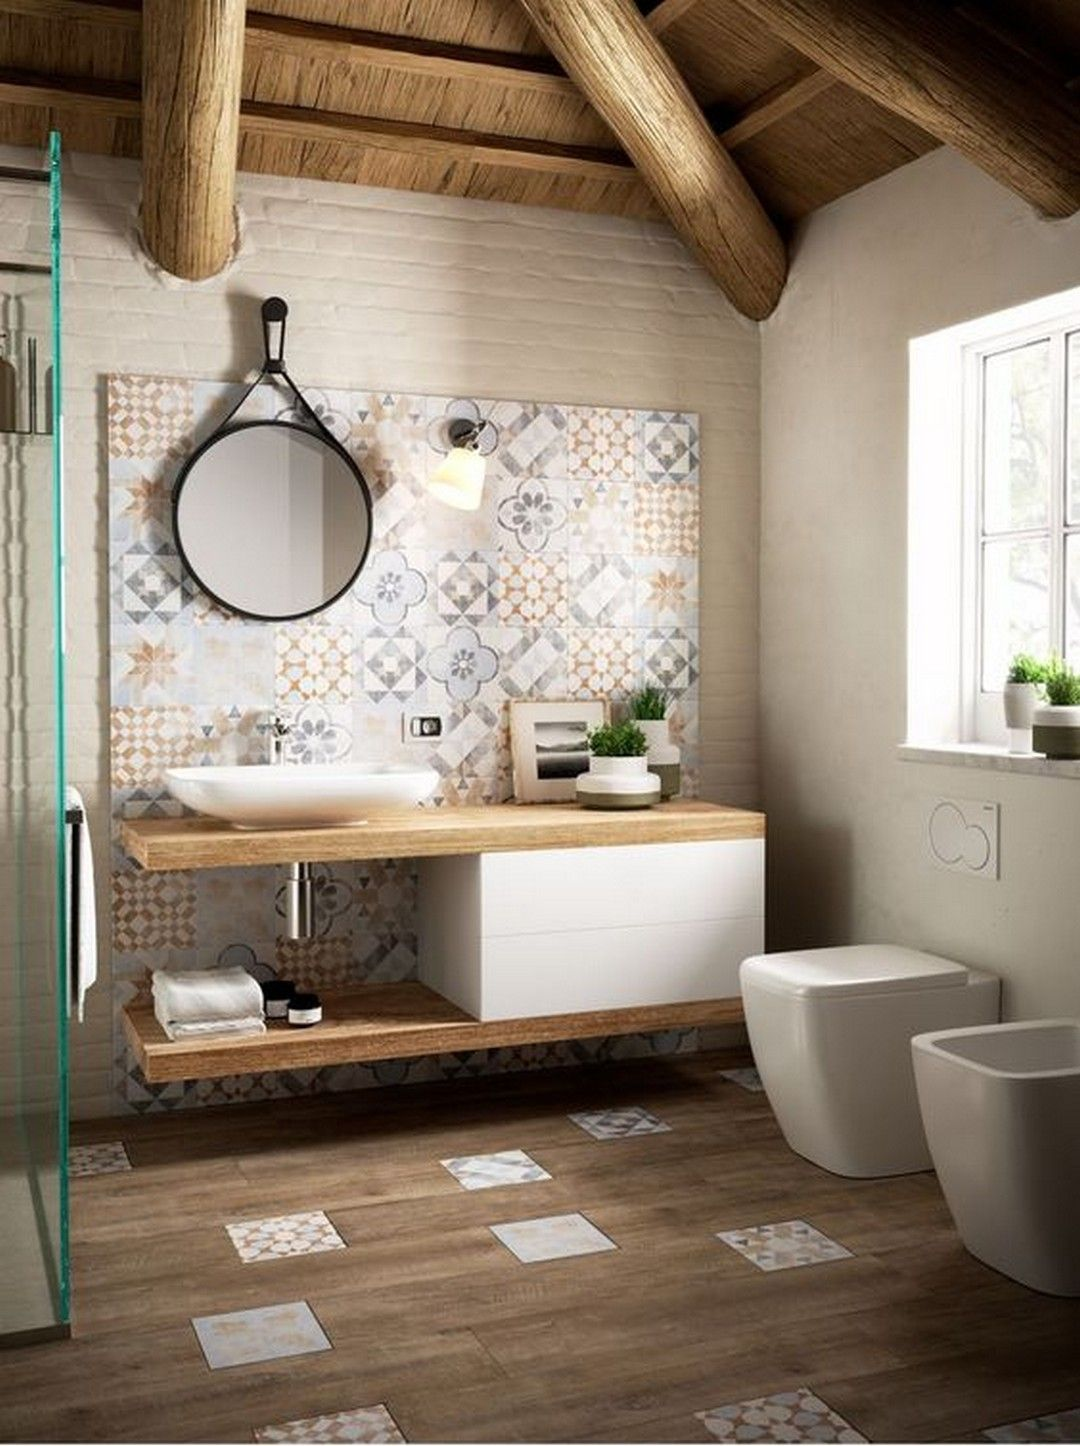 Beautiful And Magnificent Looks Of Period Bathroom Designs Badezimmer Design Badezimmer